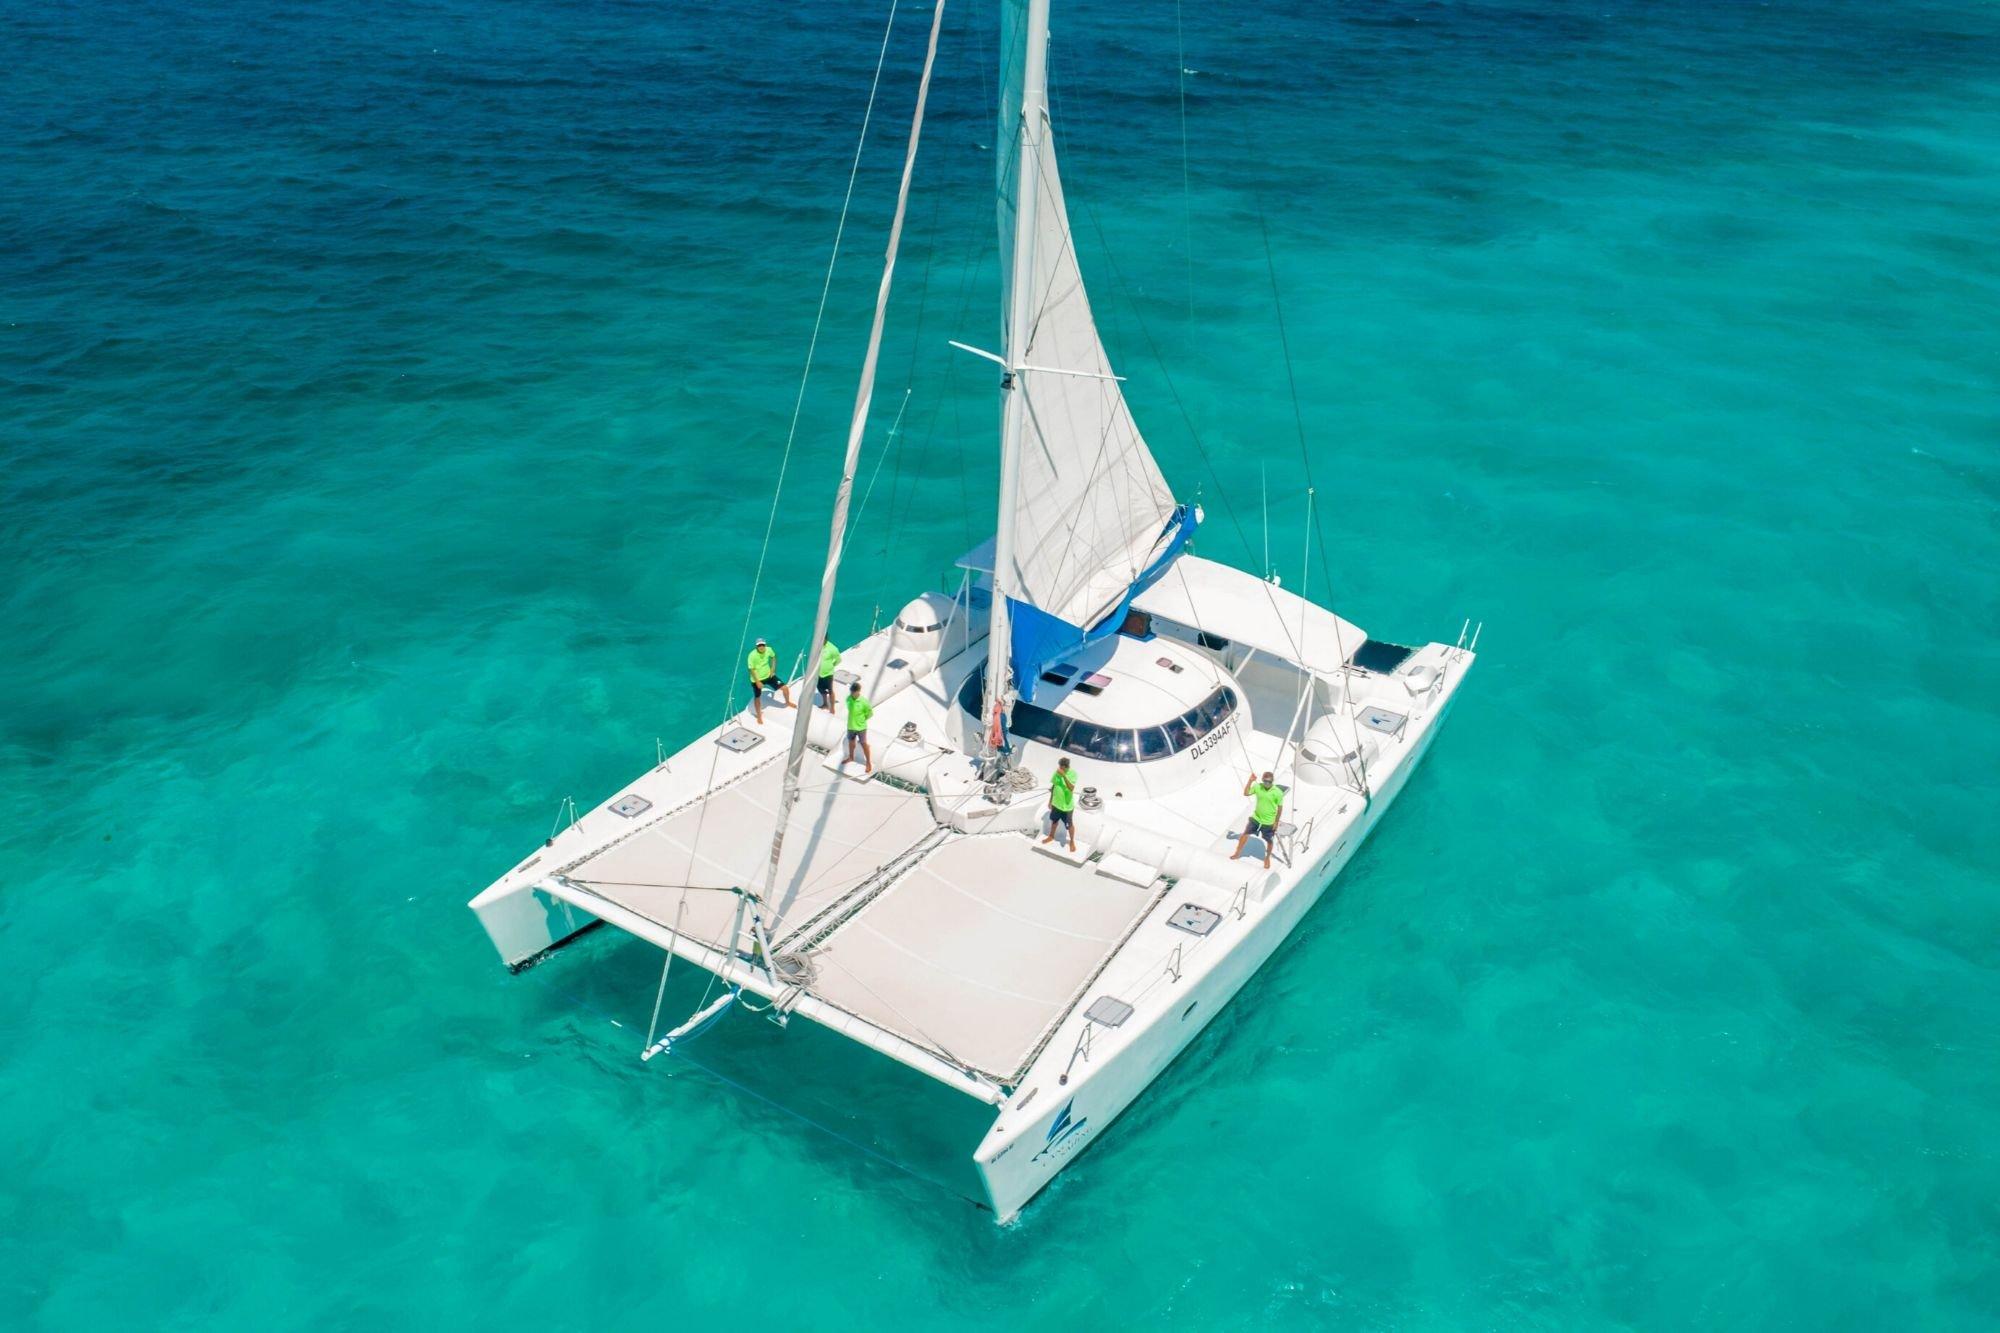 Induna - Isla Mujeres Catamaran Tour - Cancun Sailing - 2